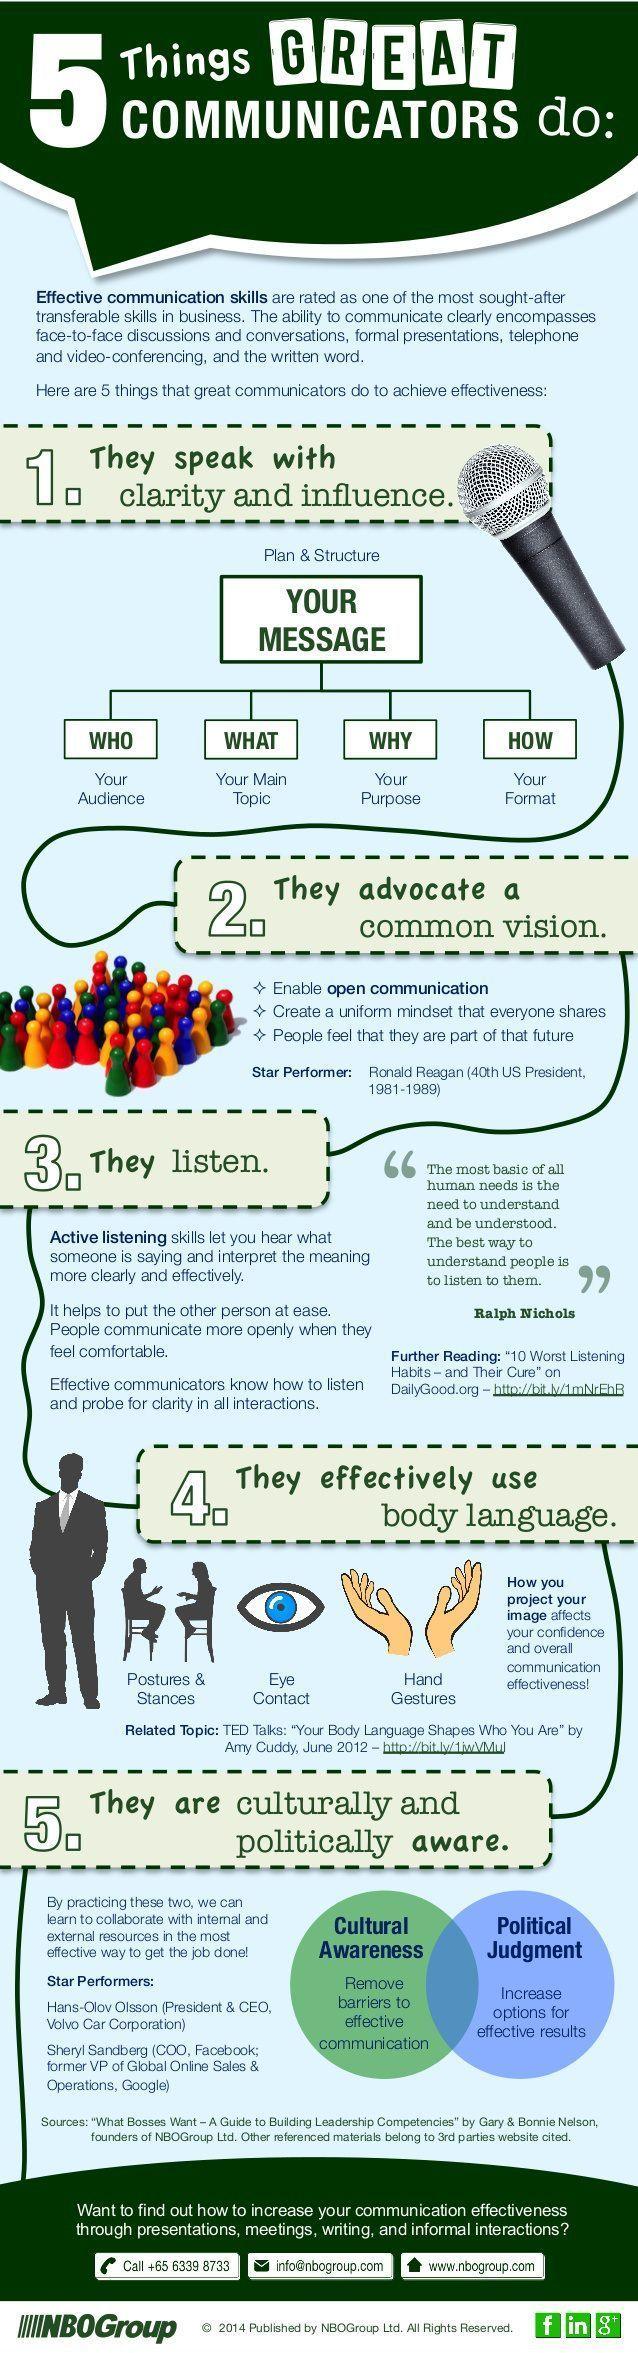 5 Things great communicators do #infografia #infographic #marketing